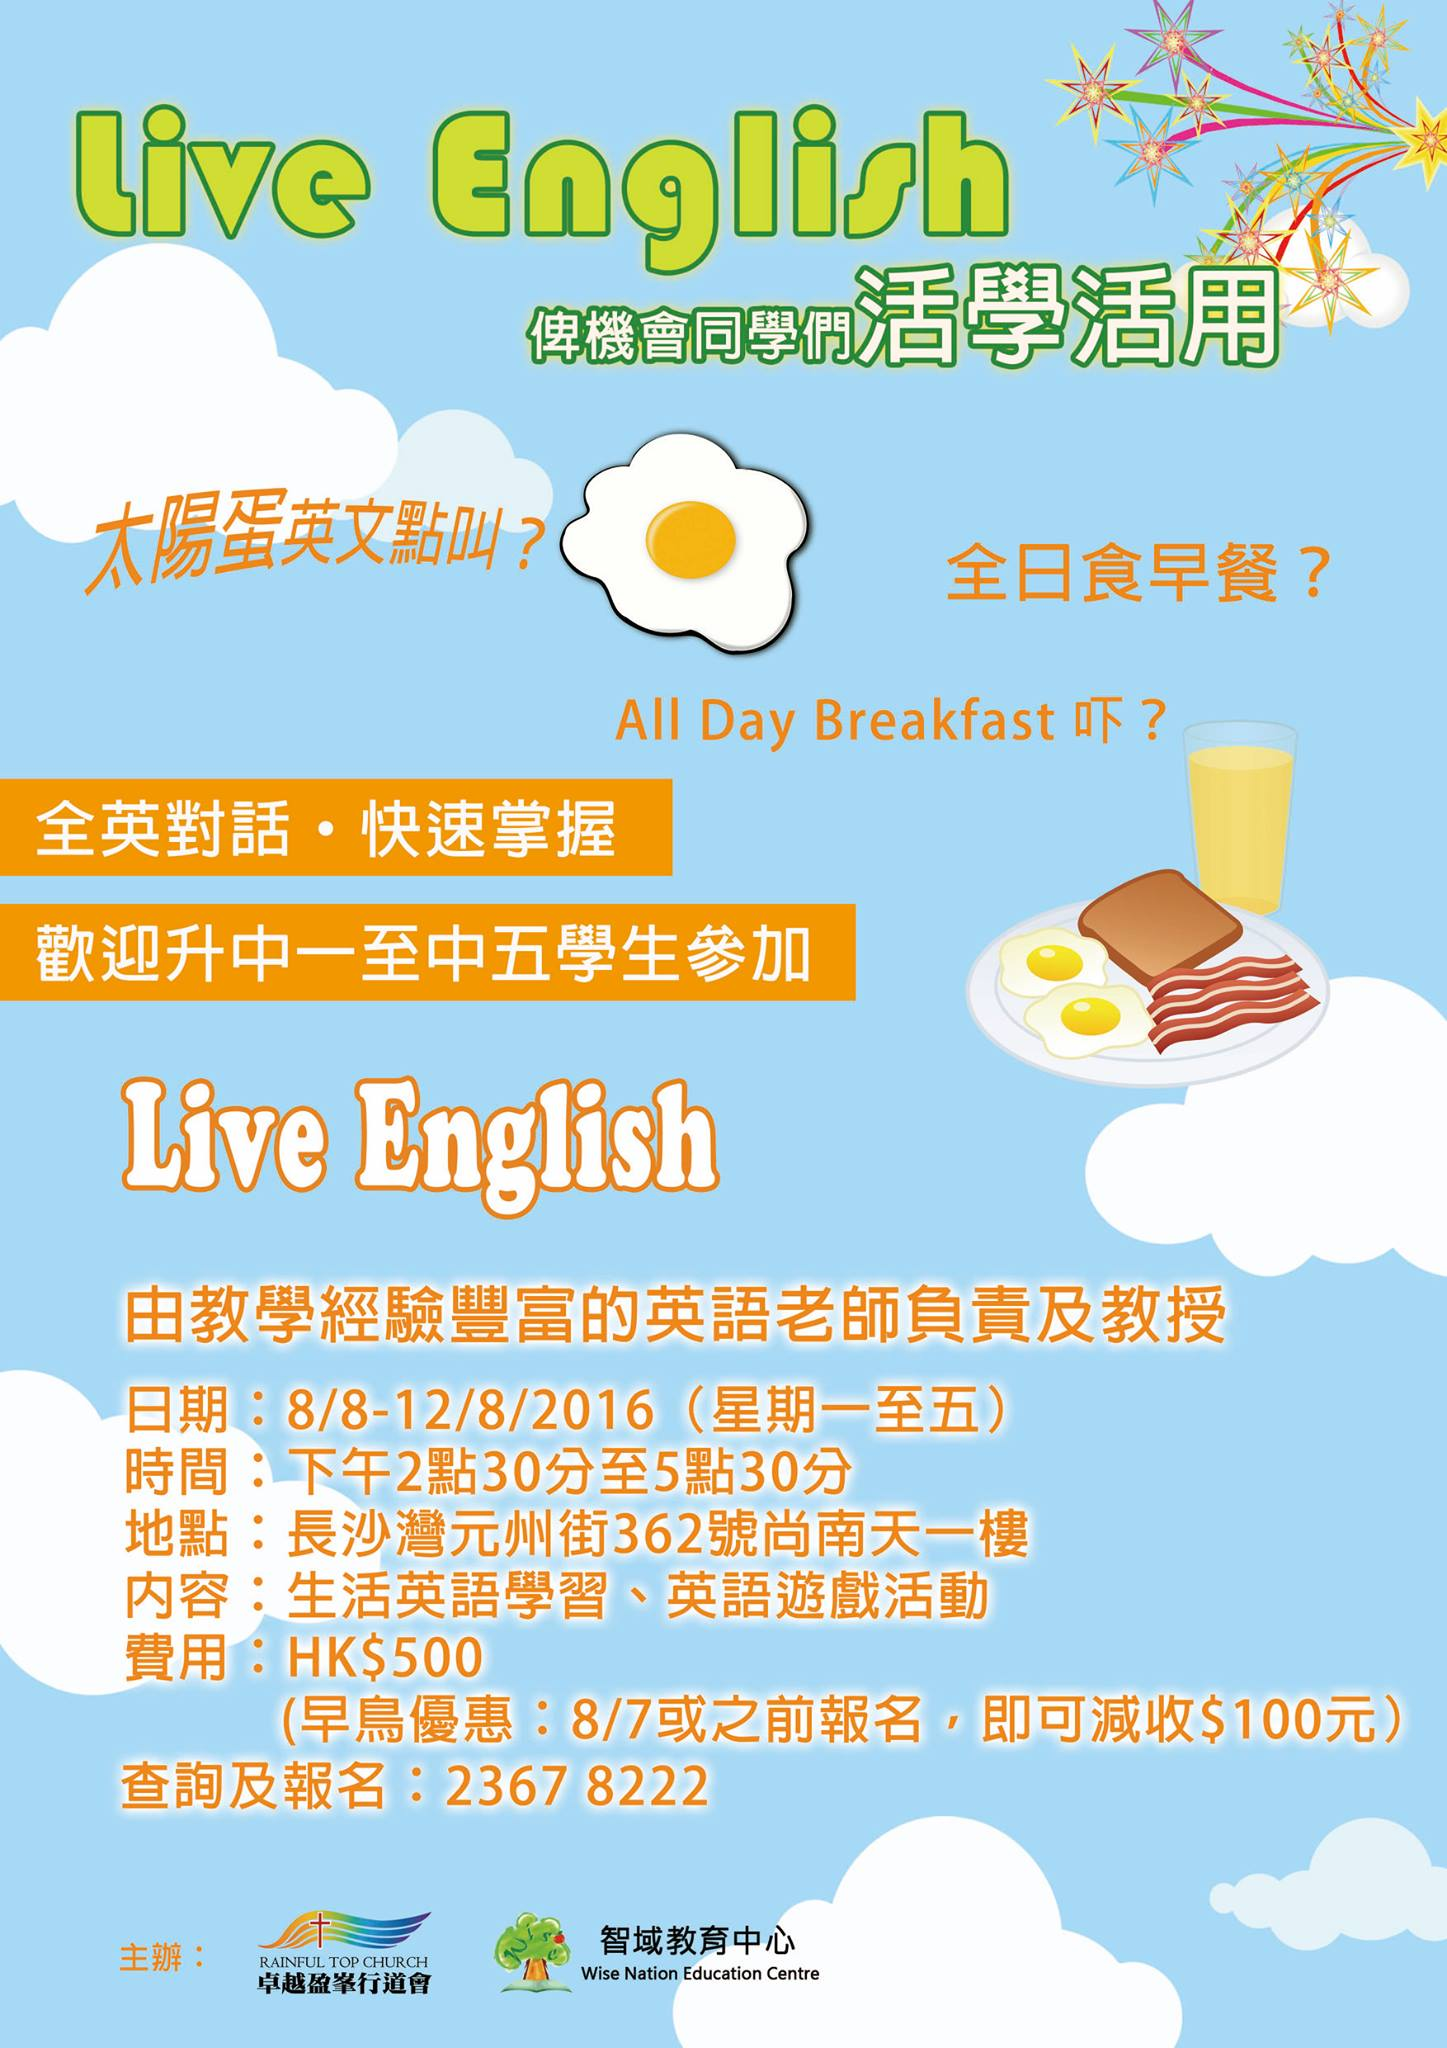 【Live English】俾機會同學們活學活用